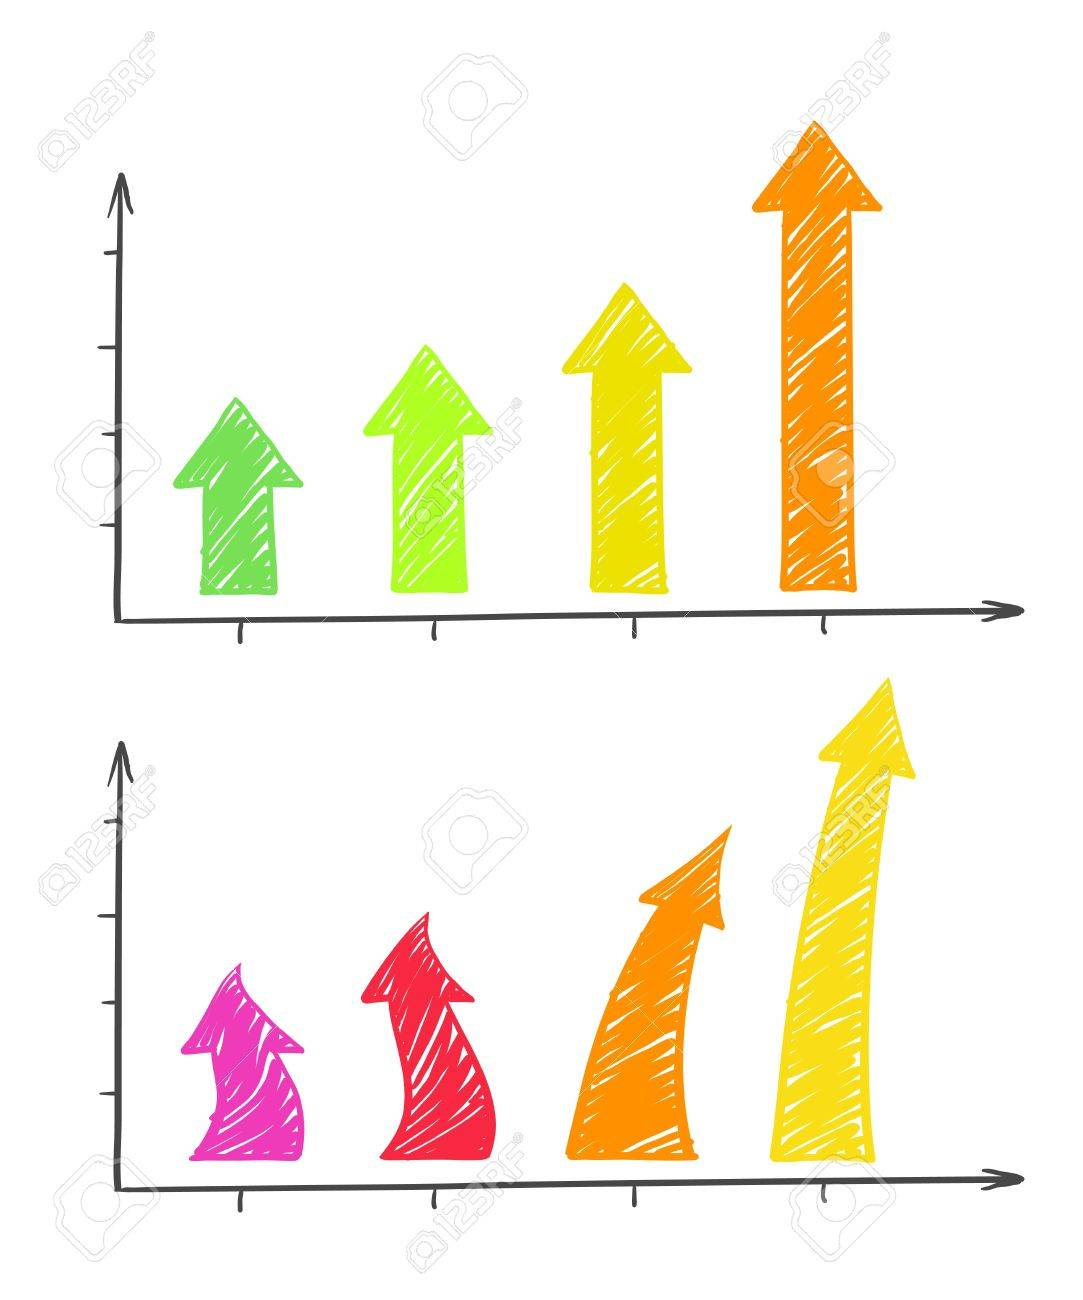 Hand-drawn Arrows Diagram Royalty Free Cliparts, Vectors, And ...